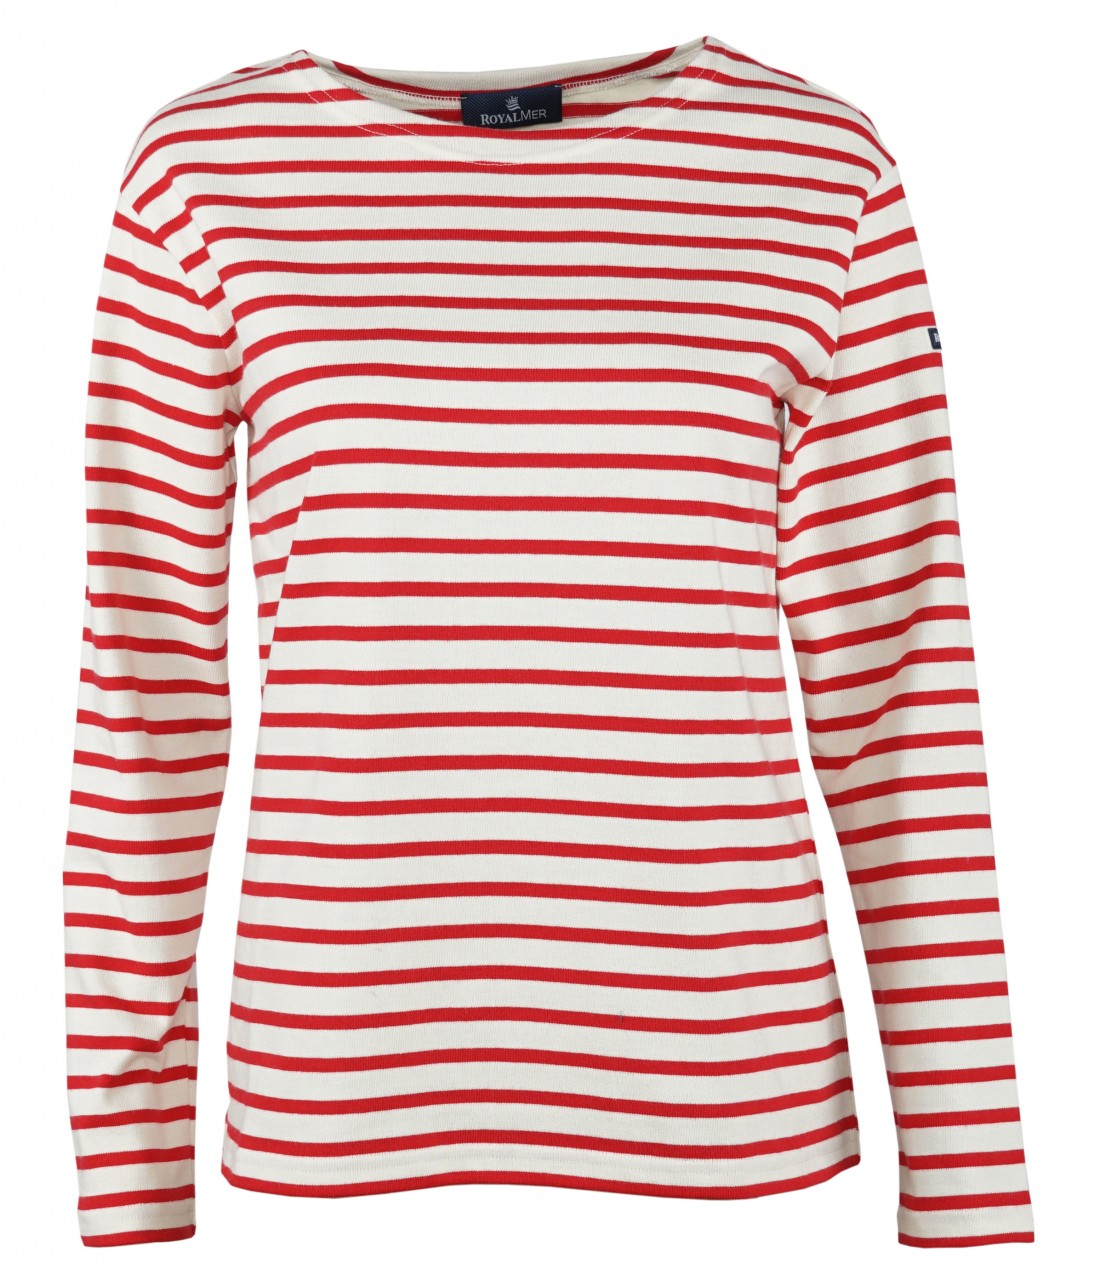 Royal Mer Streifenshirt Damen Ecru Rot Langarm